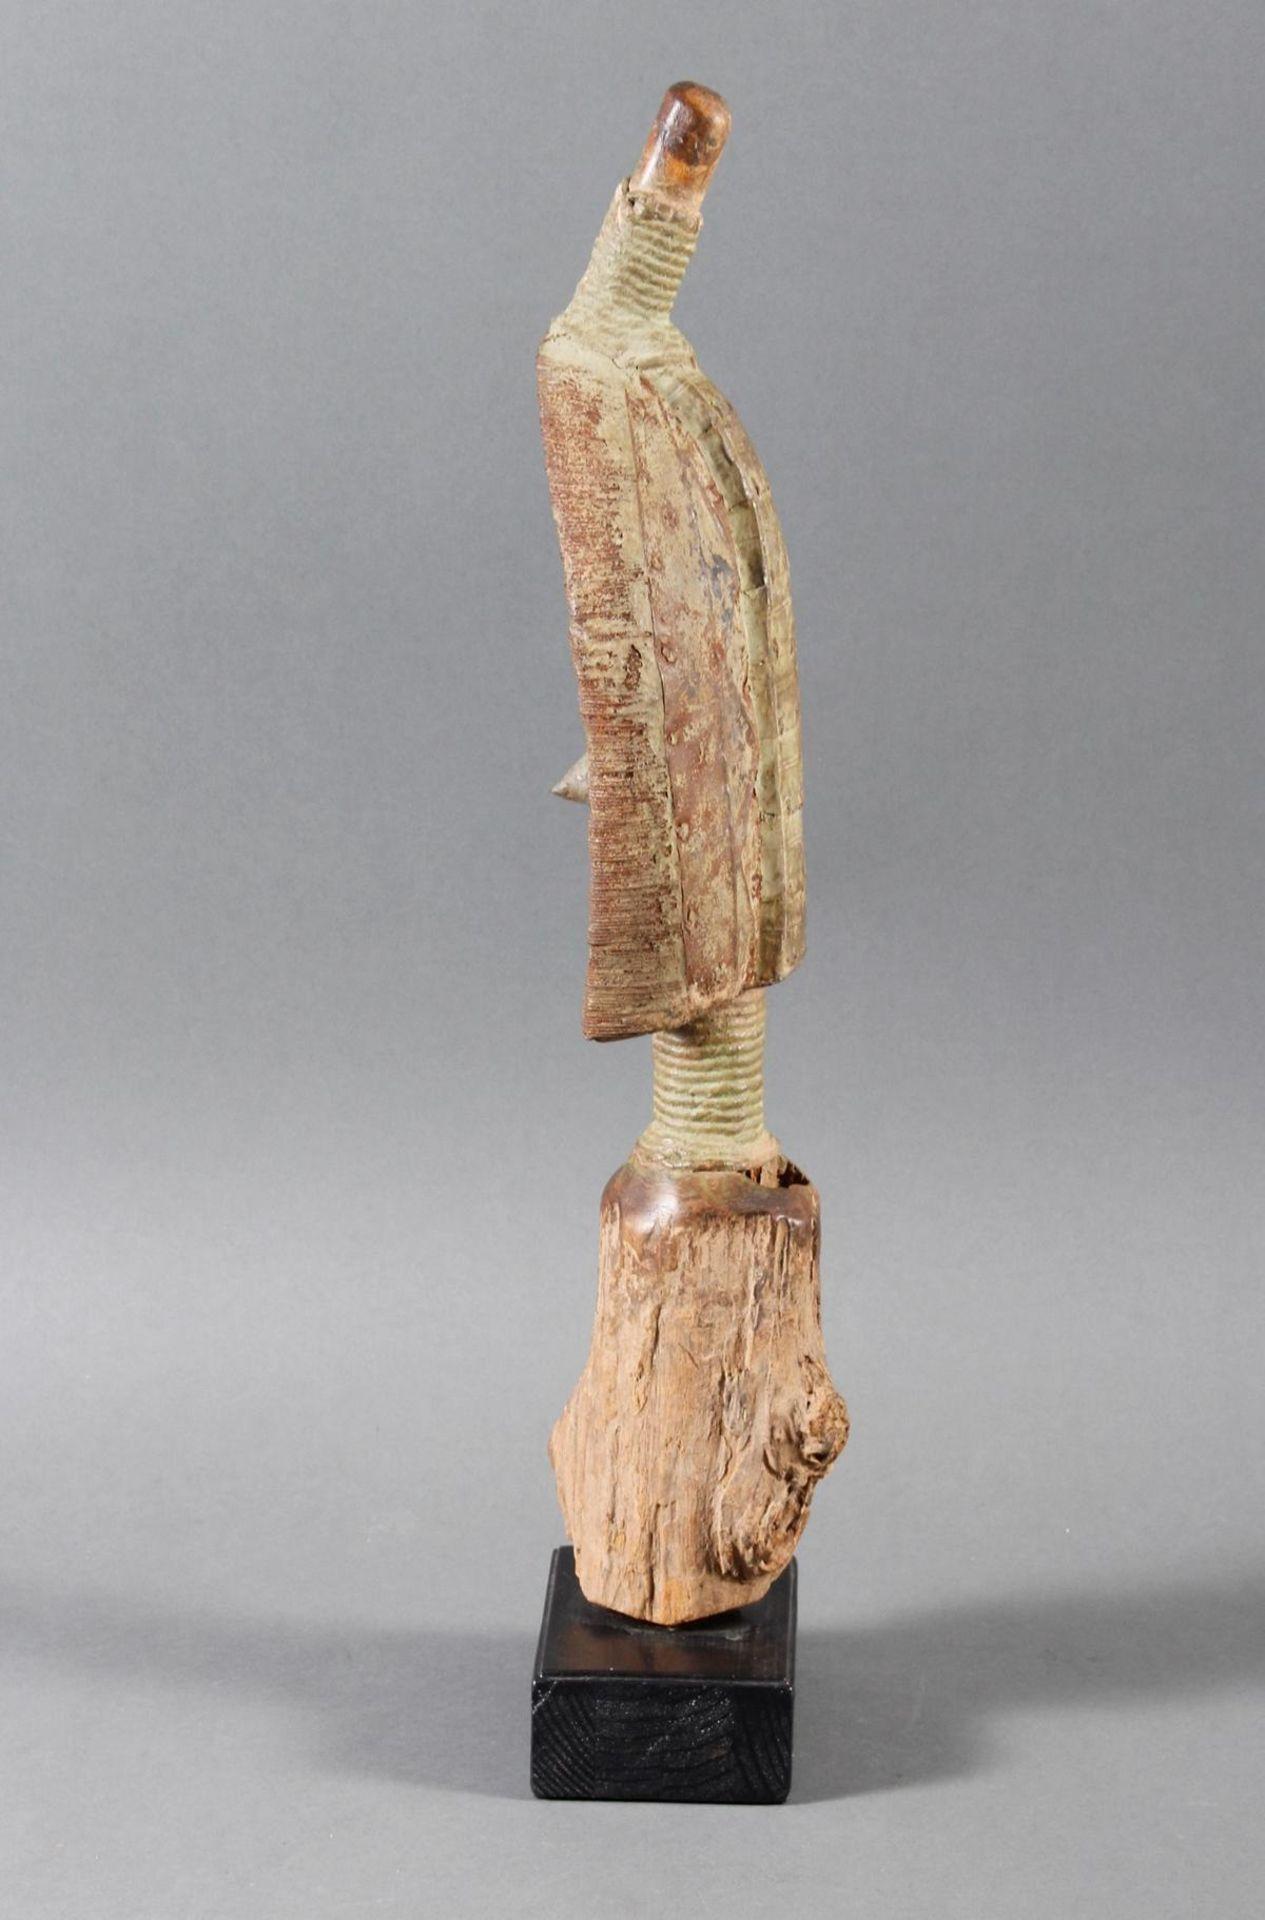 Grabwächter, Reliquiarfigur, Mahongwe / Gabun - Bild 7 aus 7